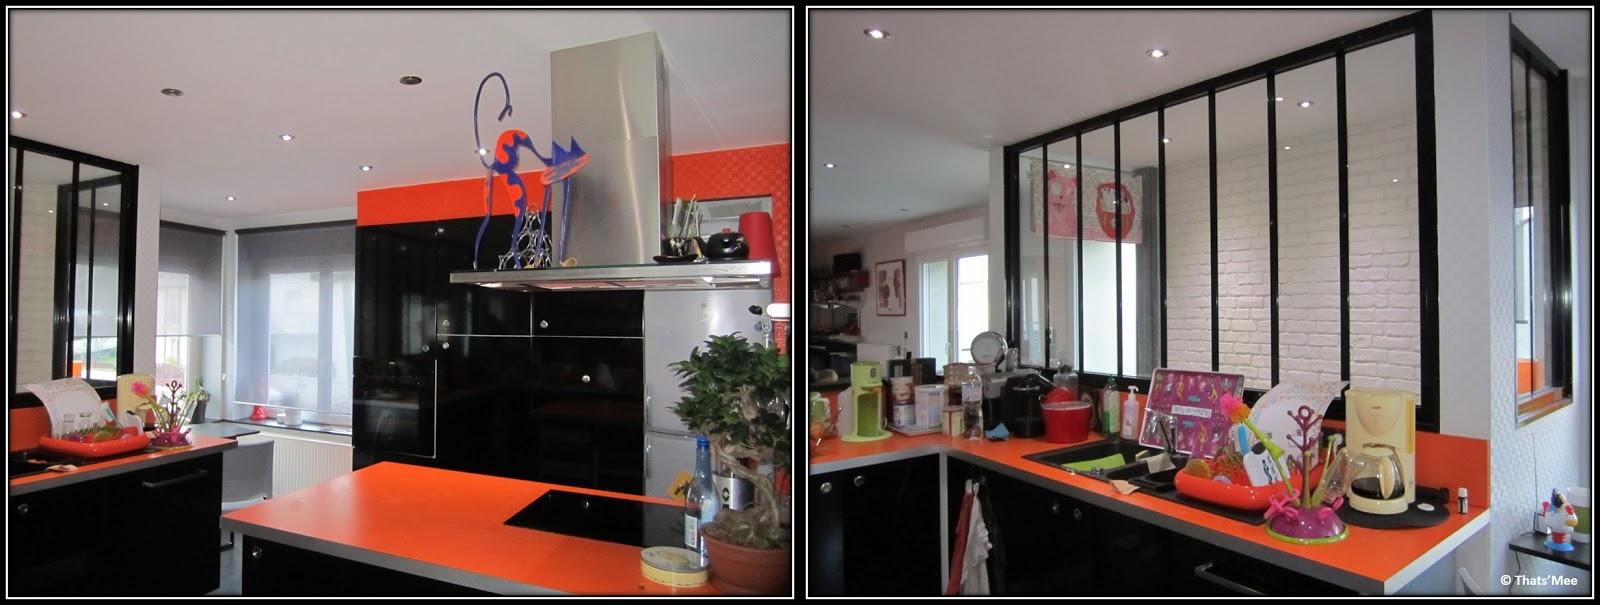 thats 39 mee ayelee une fille un gars une d co. Black Bedroom Furniture Sets. Home Design Ideas